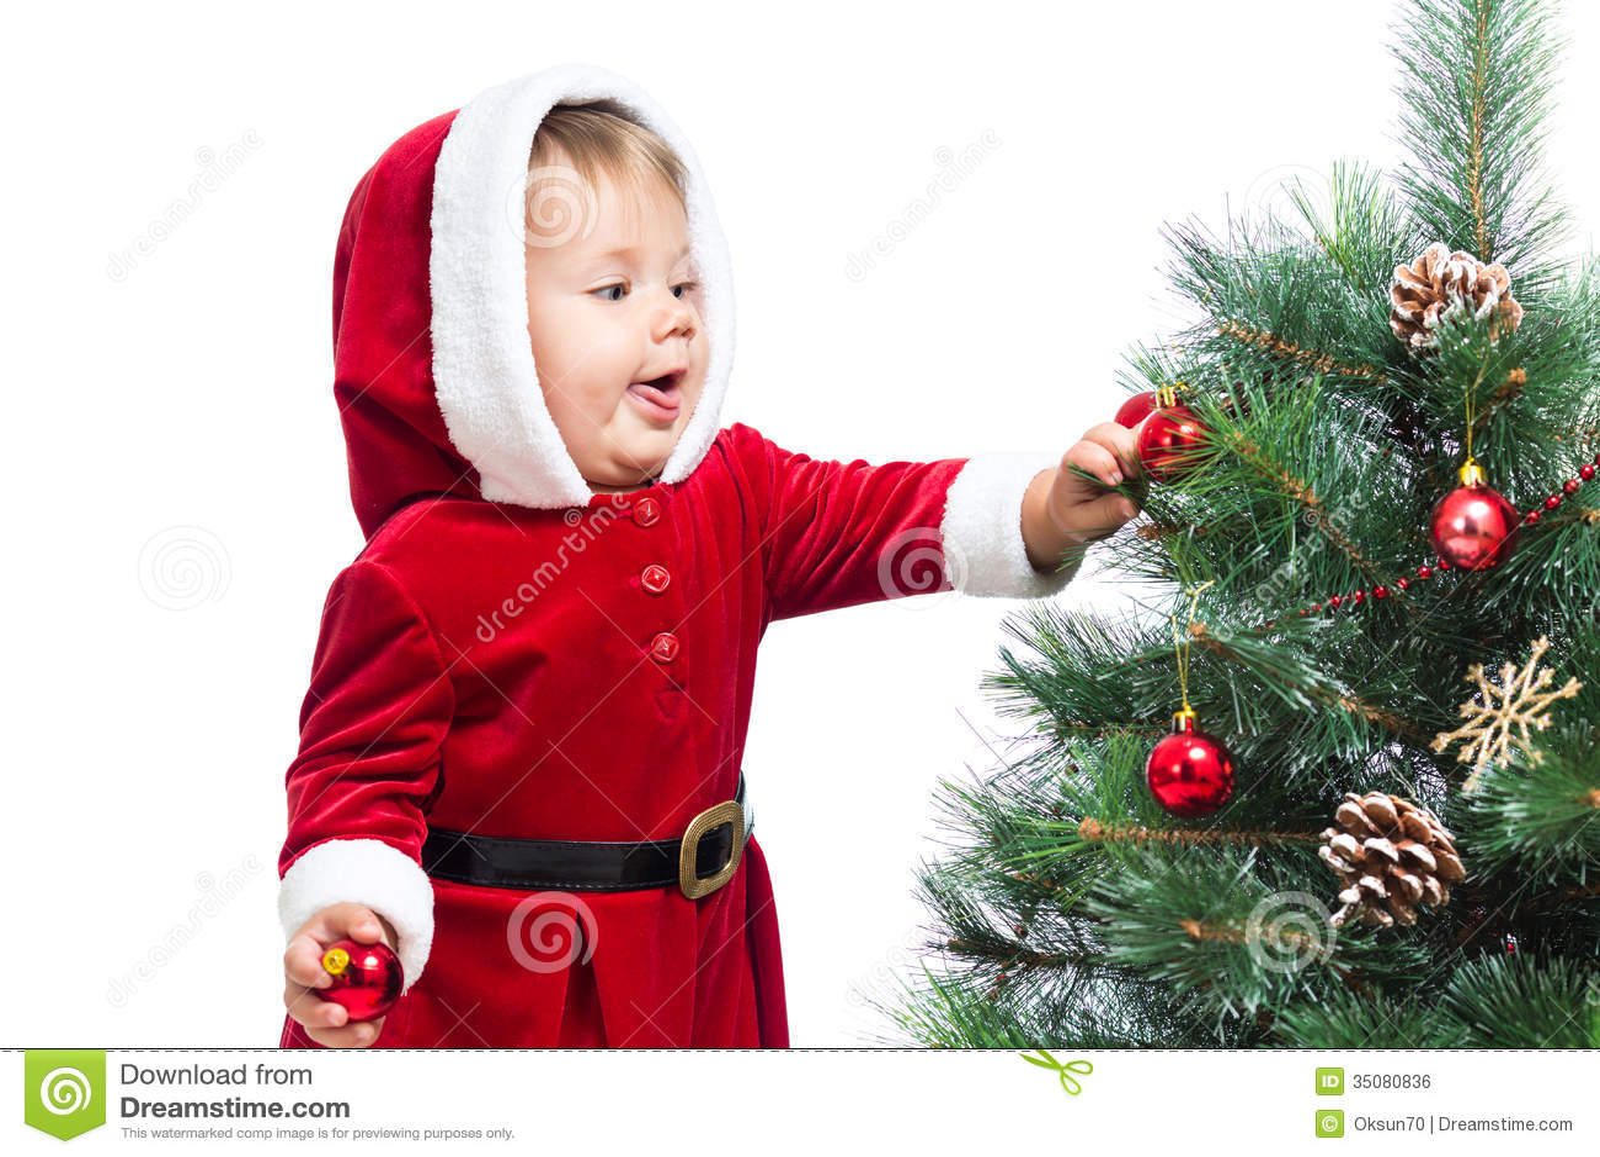 Baby decorating christmas tree stock photo image of for Baby christmas tree decoration